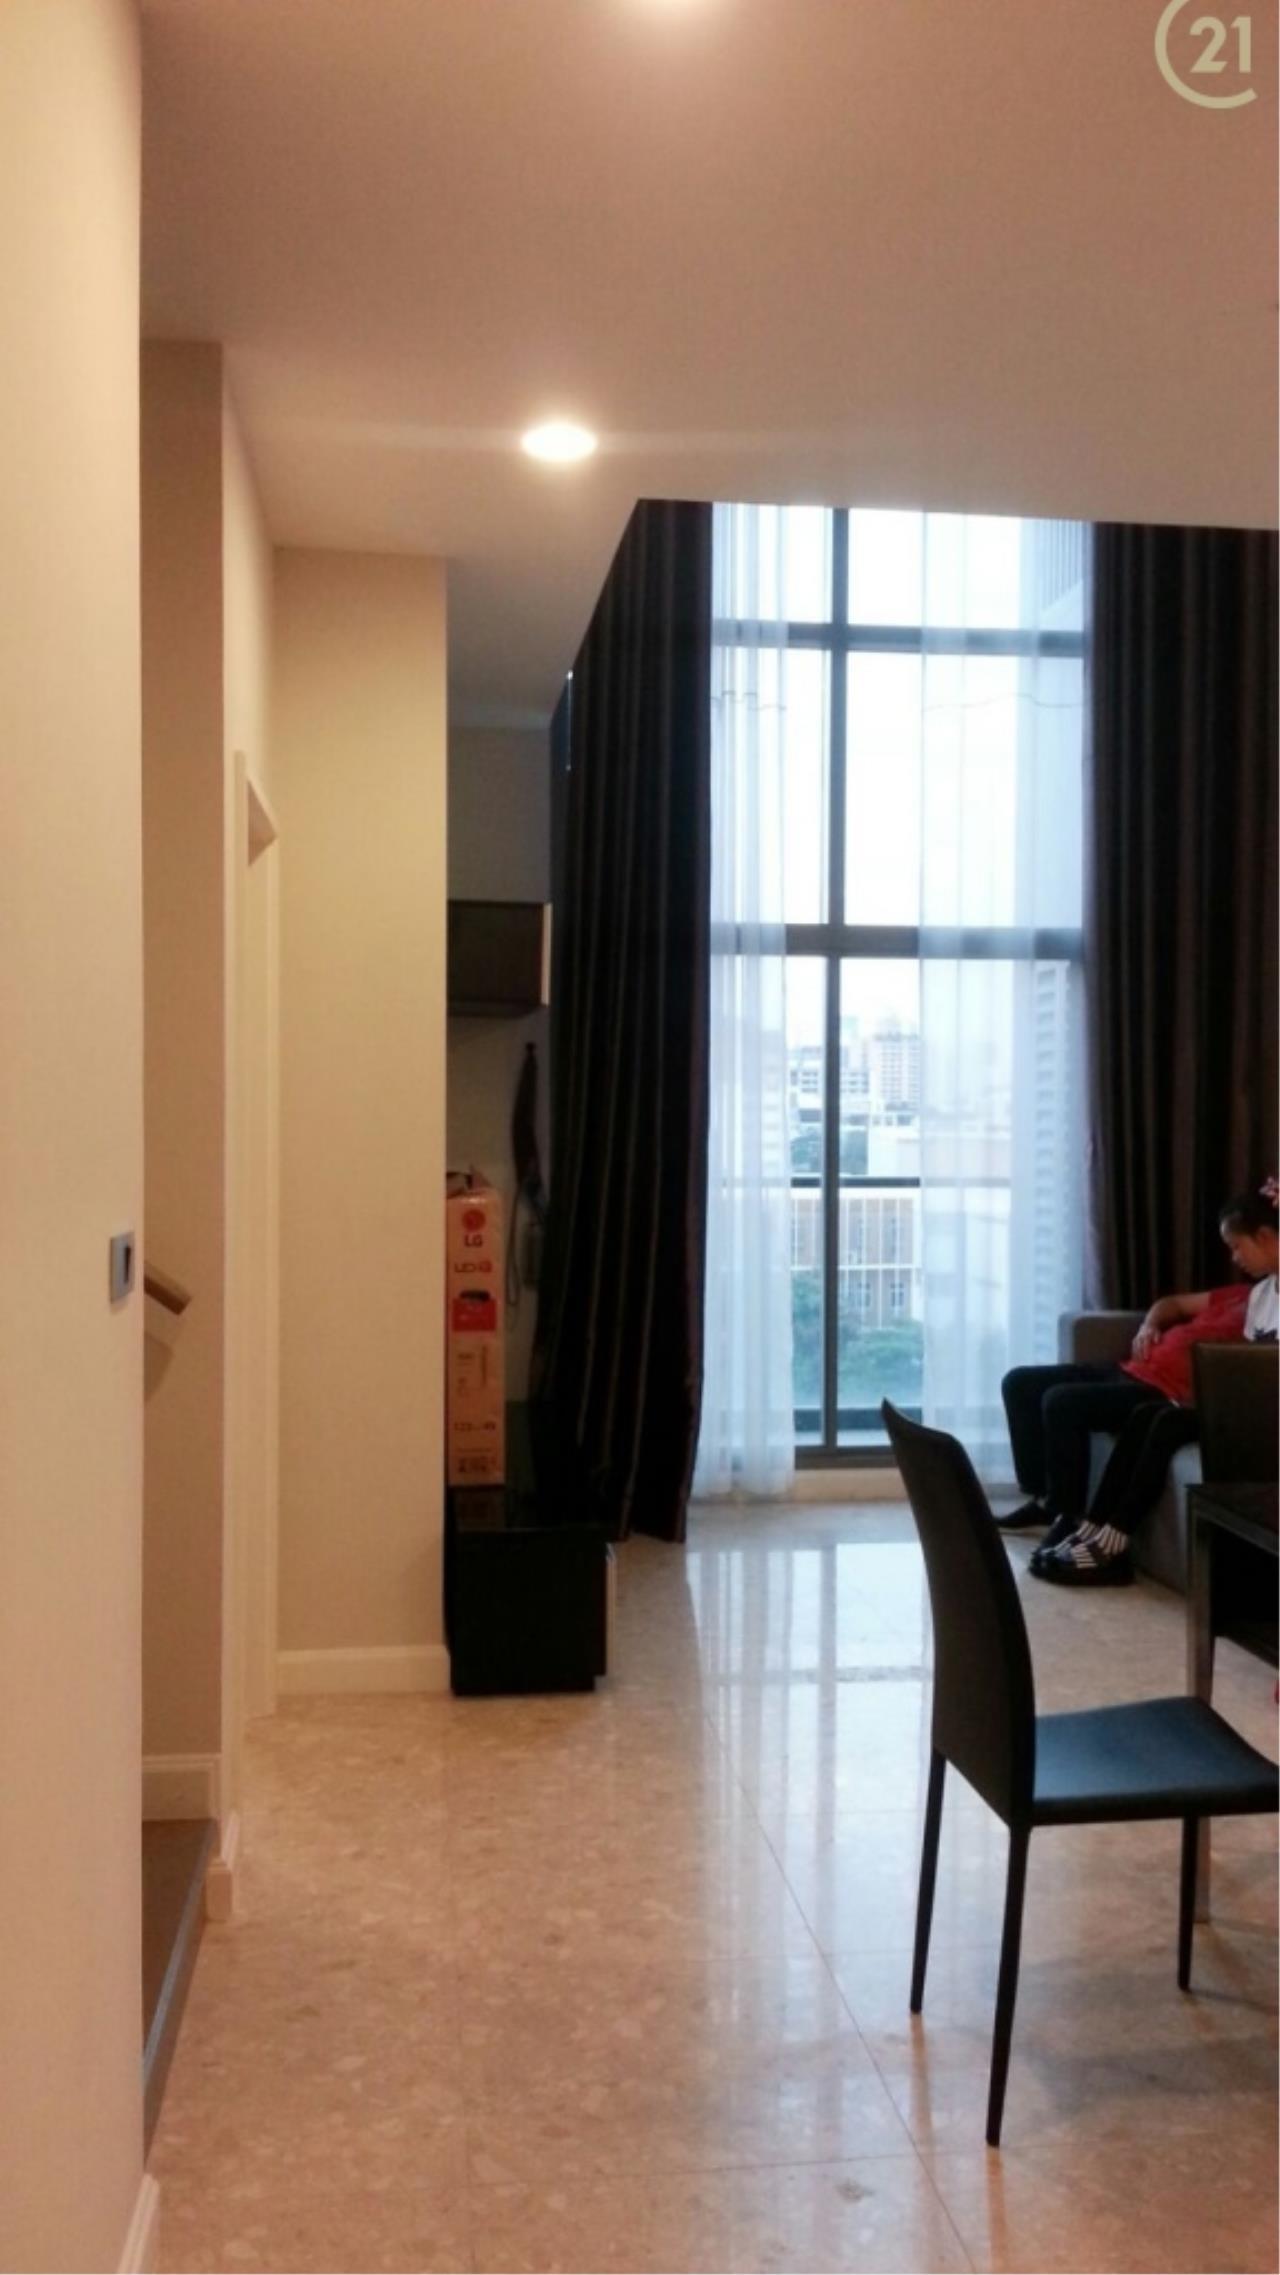 Century21 Skylux Agency's The Crest Sukhumvit 34 / Condo For Sale / 2 Bedroom / 86.05 SQM / BTS Thong Lo / Bangkok 2